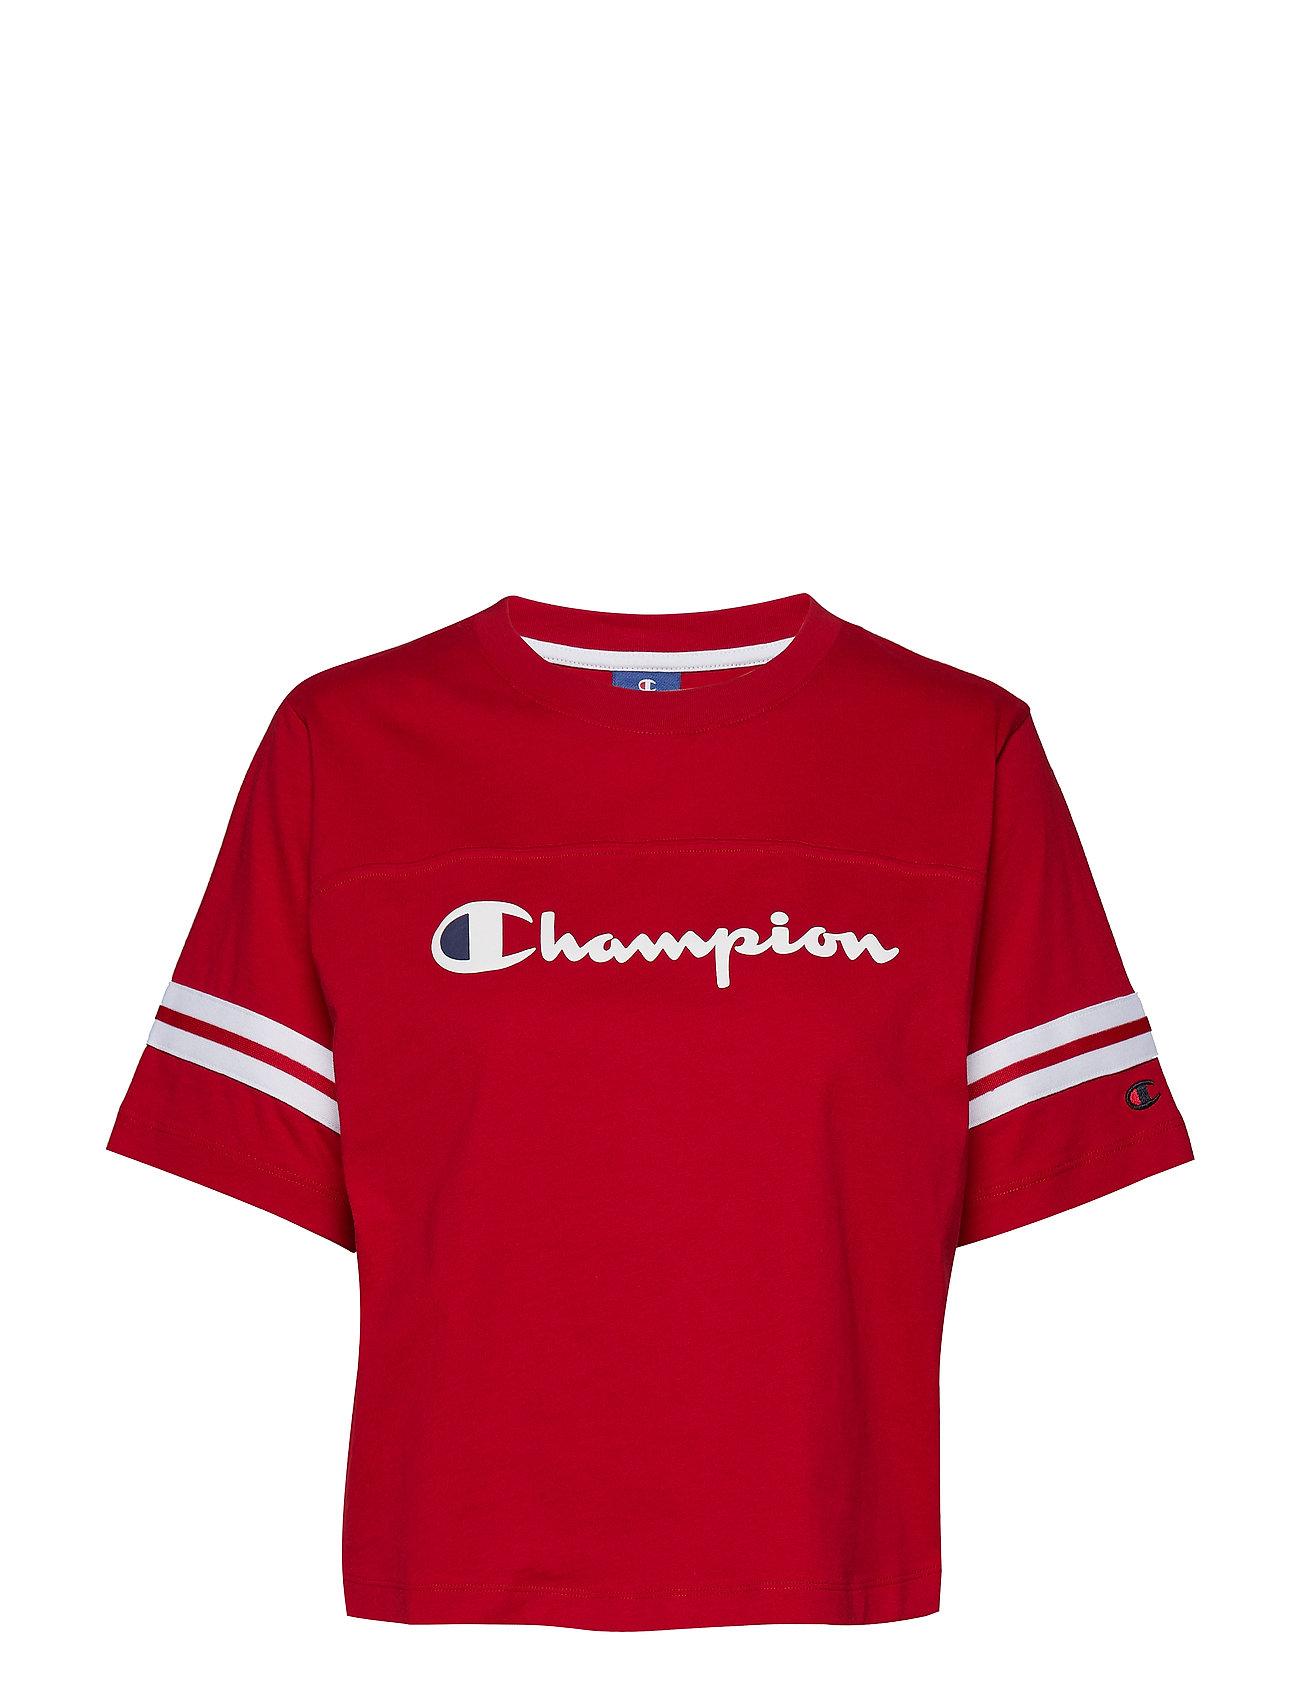 39b7168f5f84 Crewneck Croptop (Red) (24.50 €) - Champion Rochester - | Boozt.com